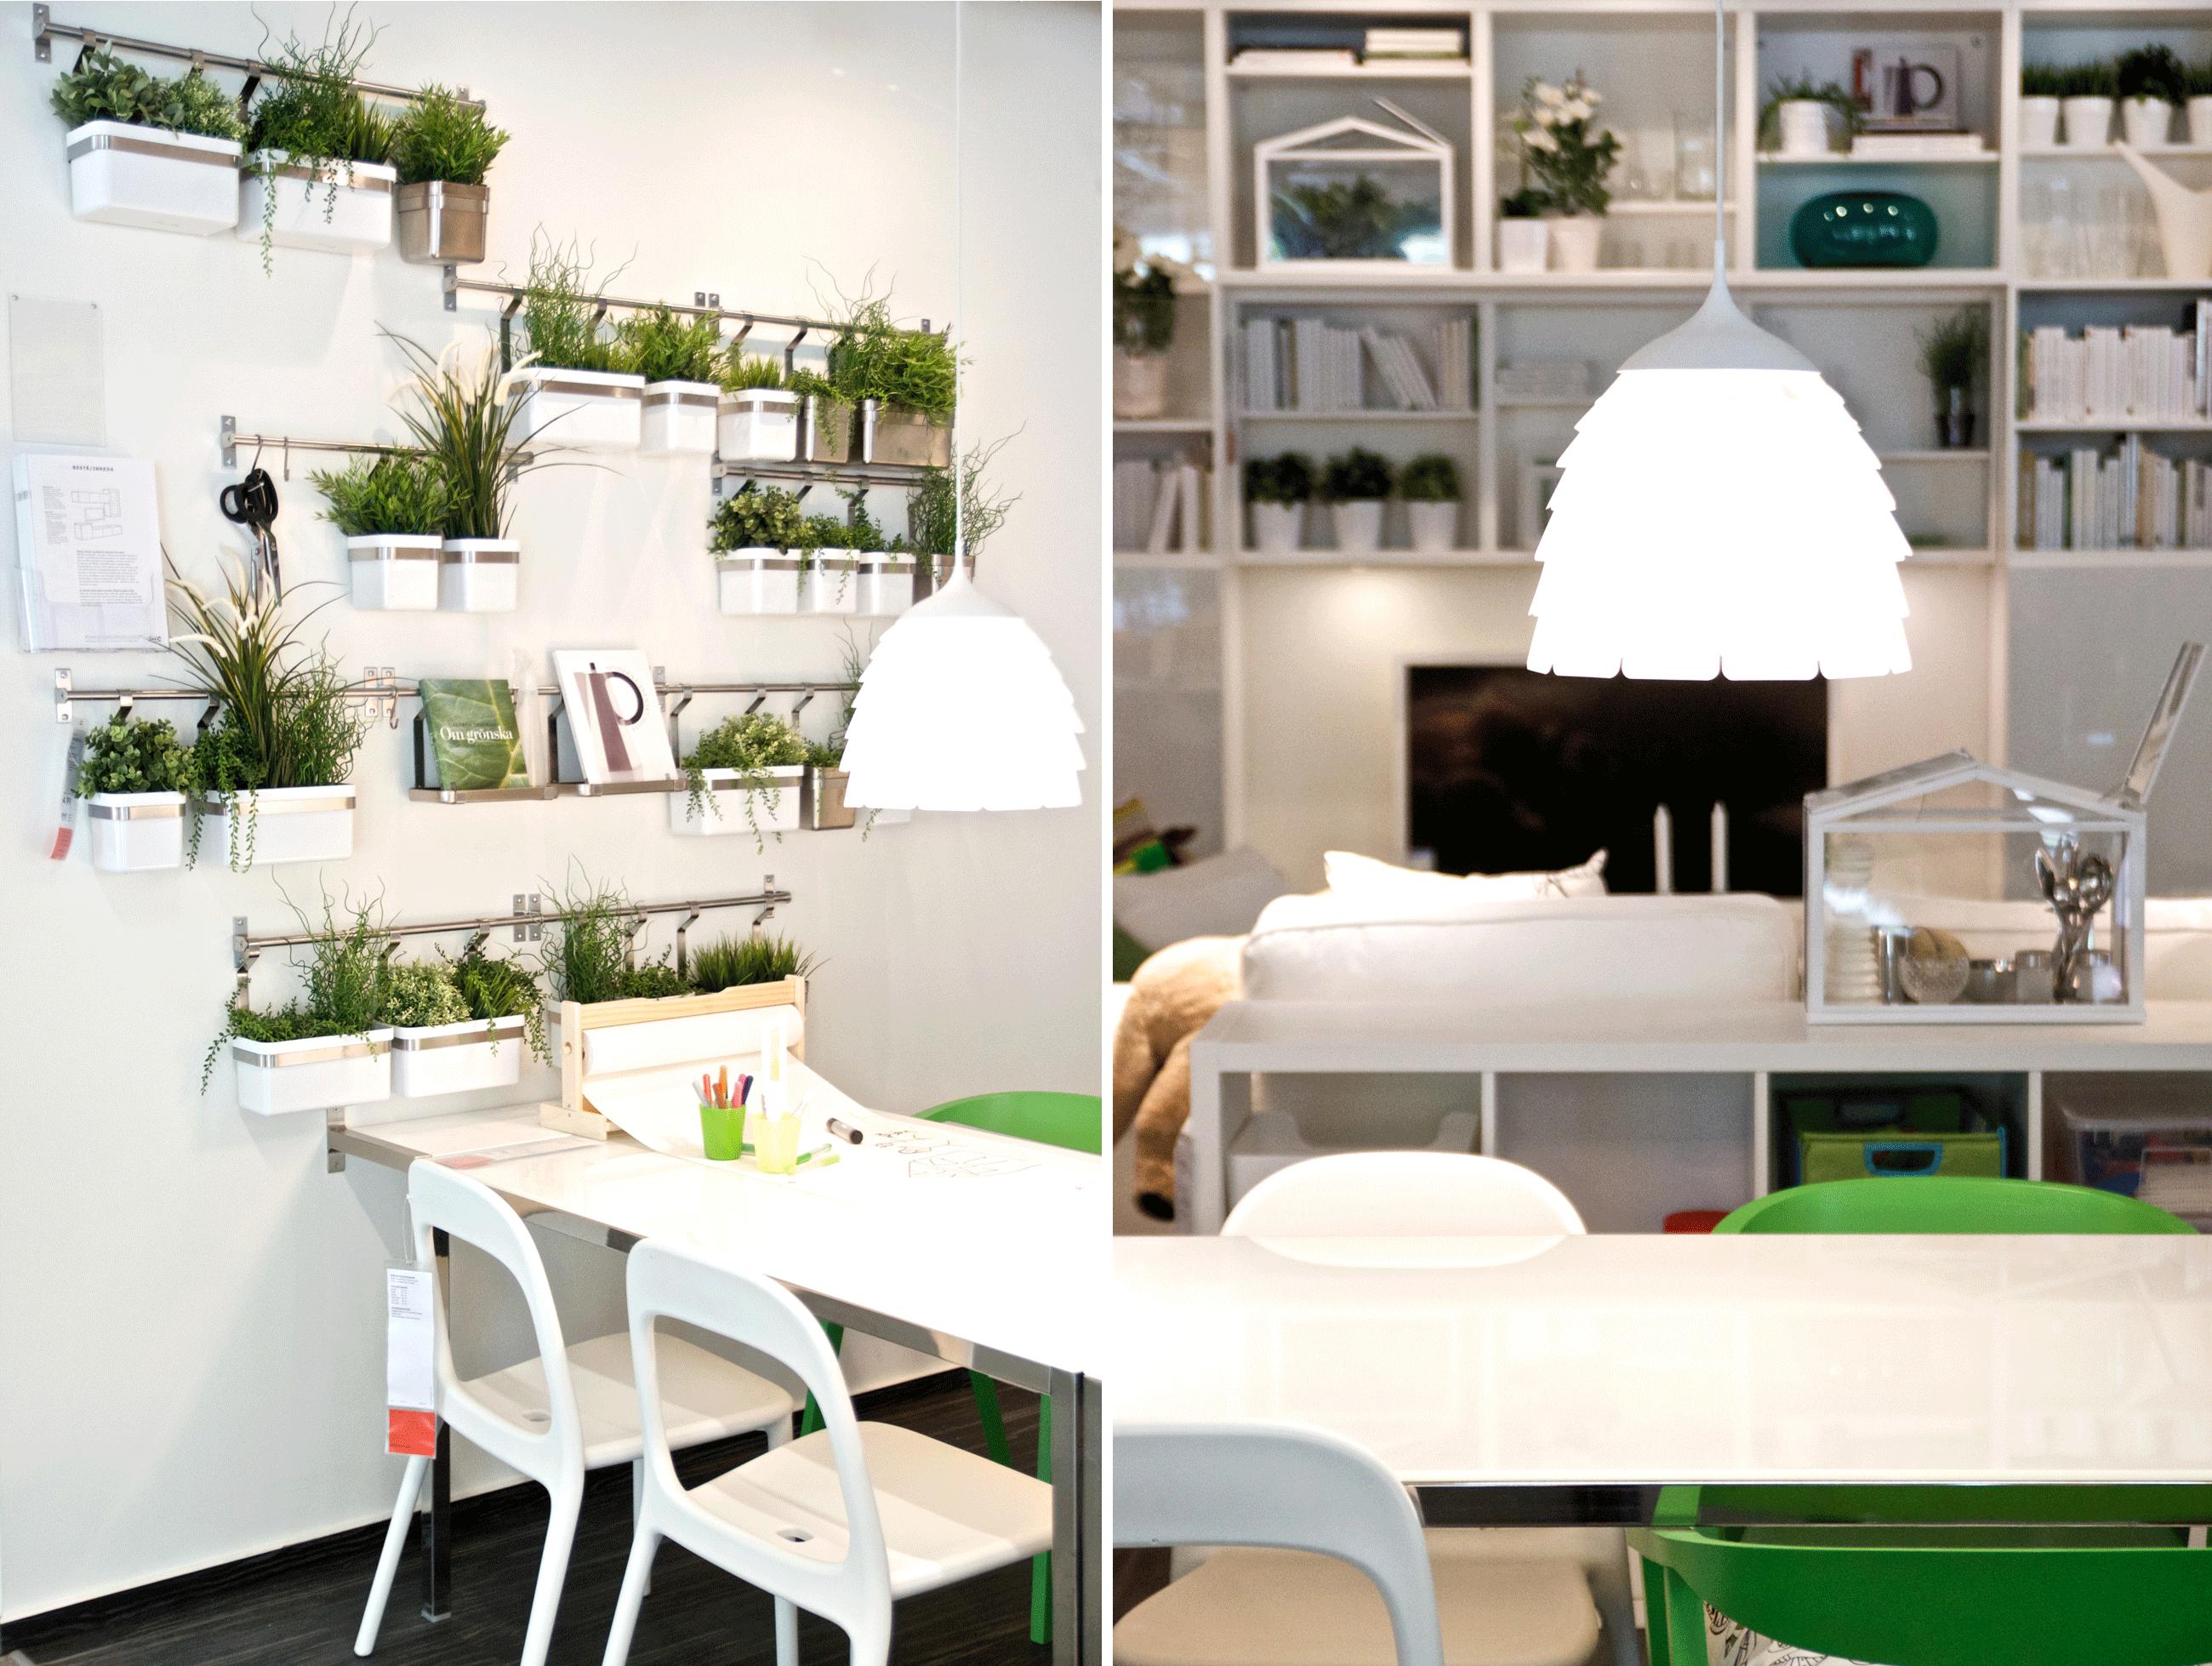 Ikea-Altona-Interior-Grün-Weiß